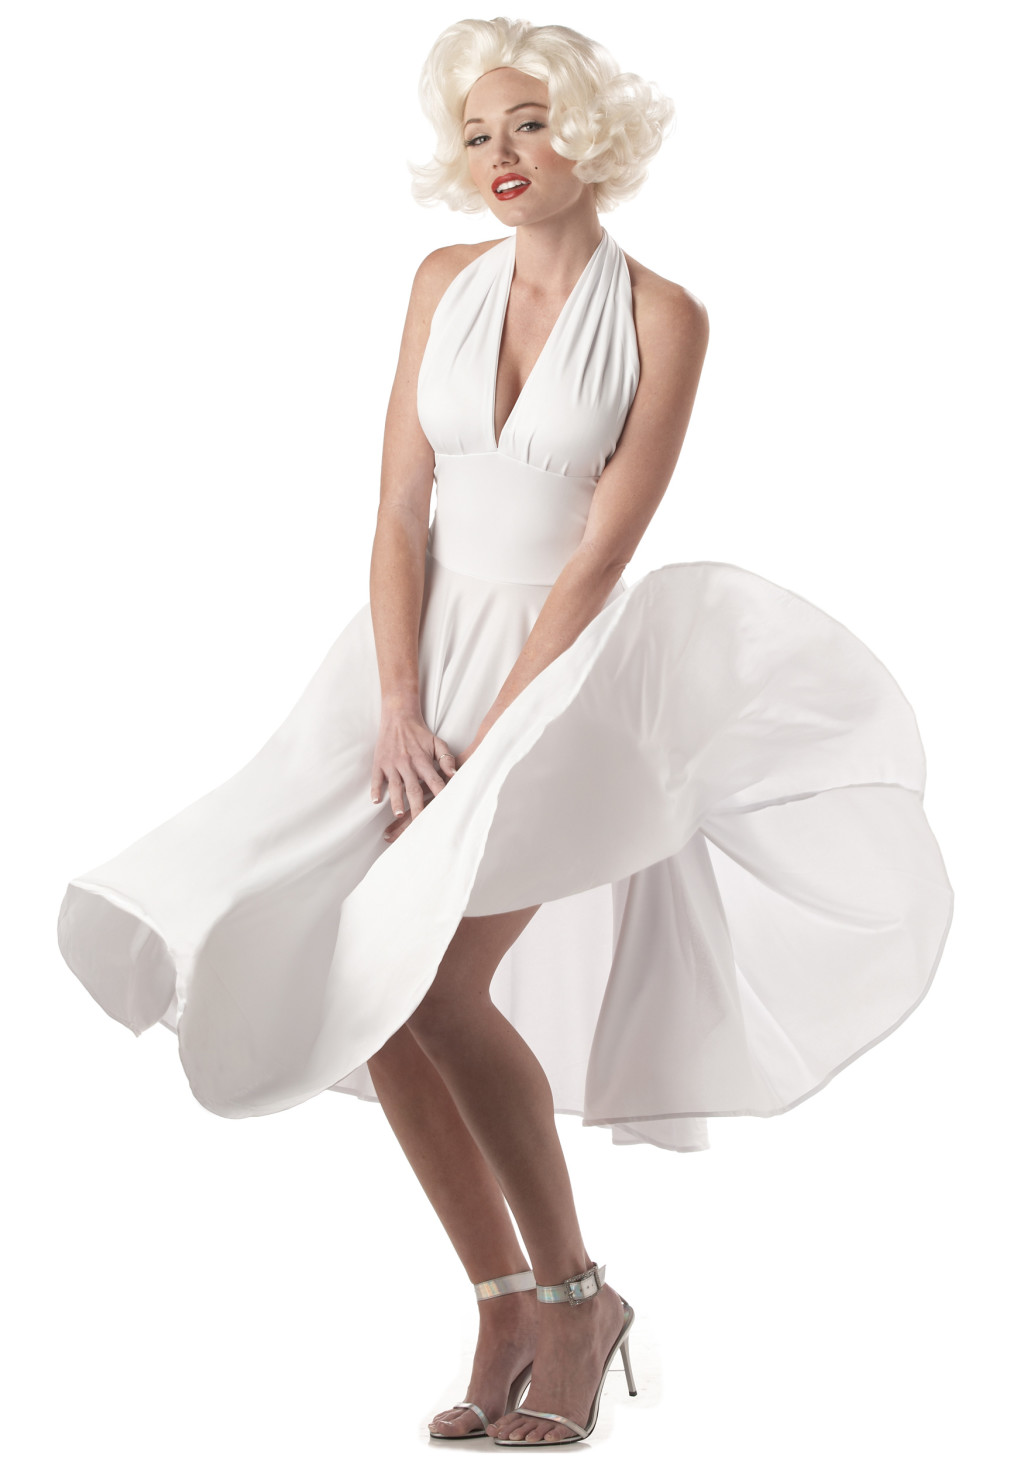 Marilyn Monroe Costume - Marilyn Monroe Costume